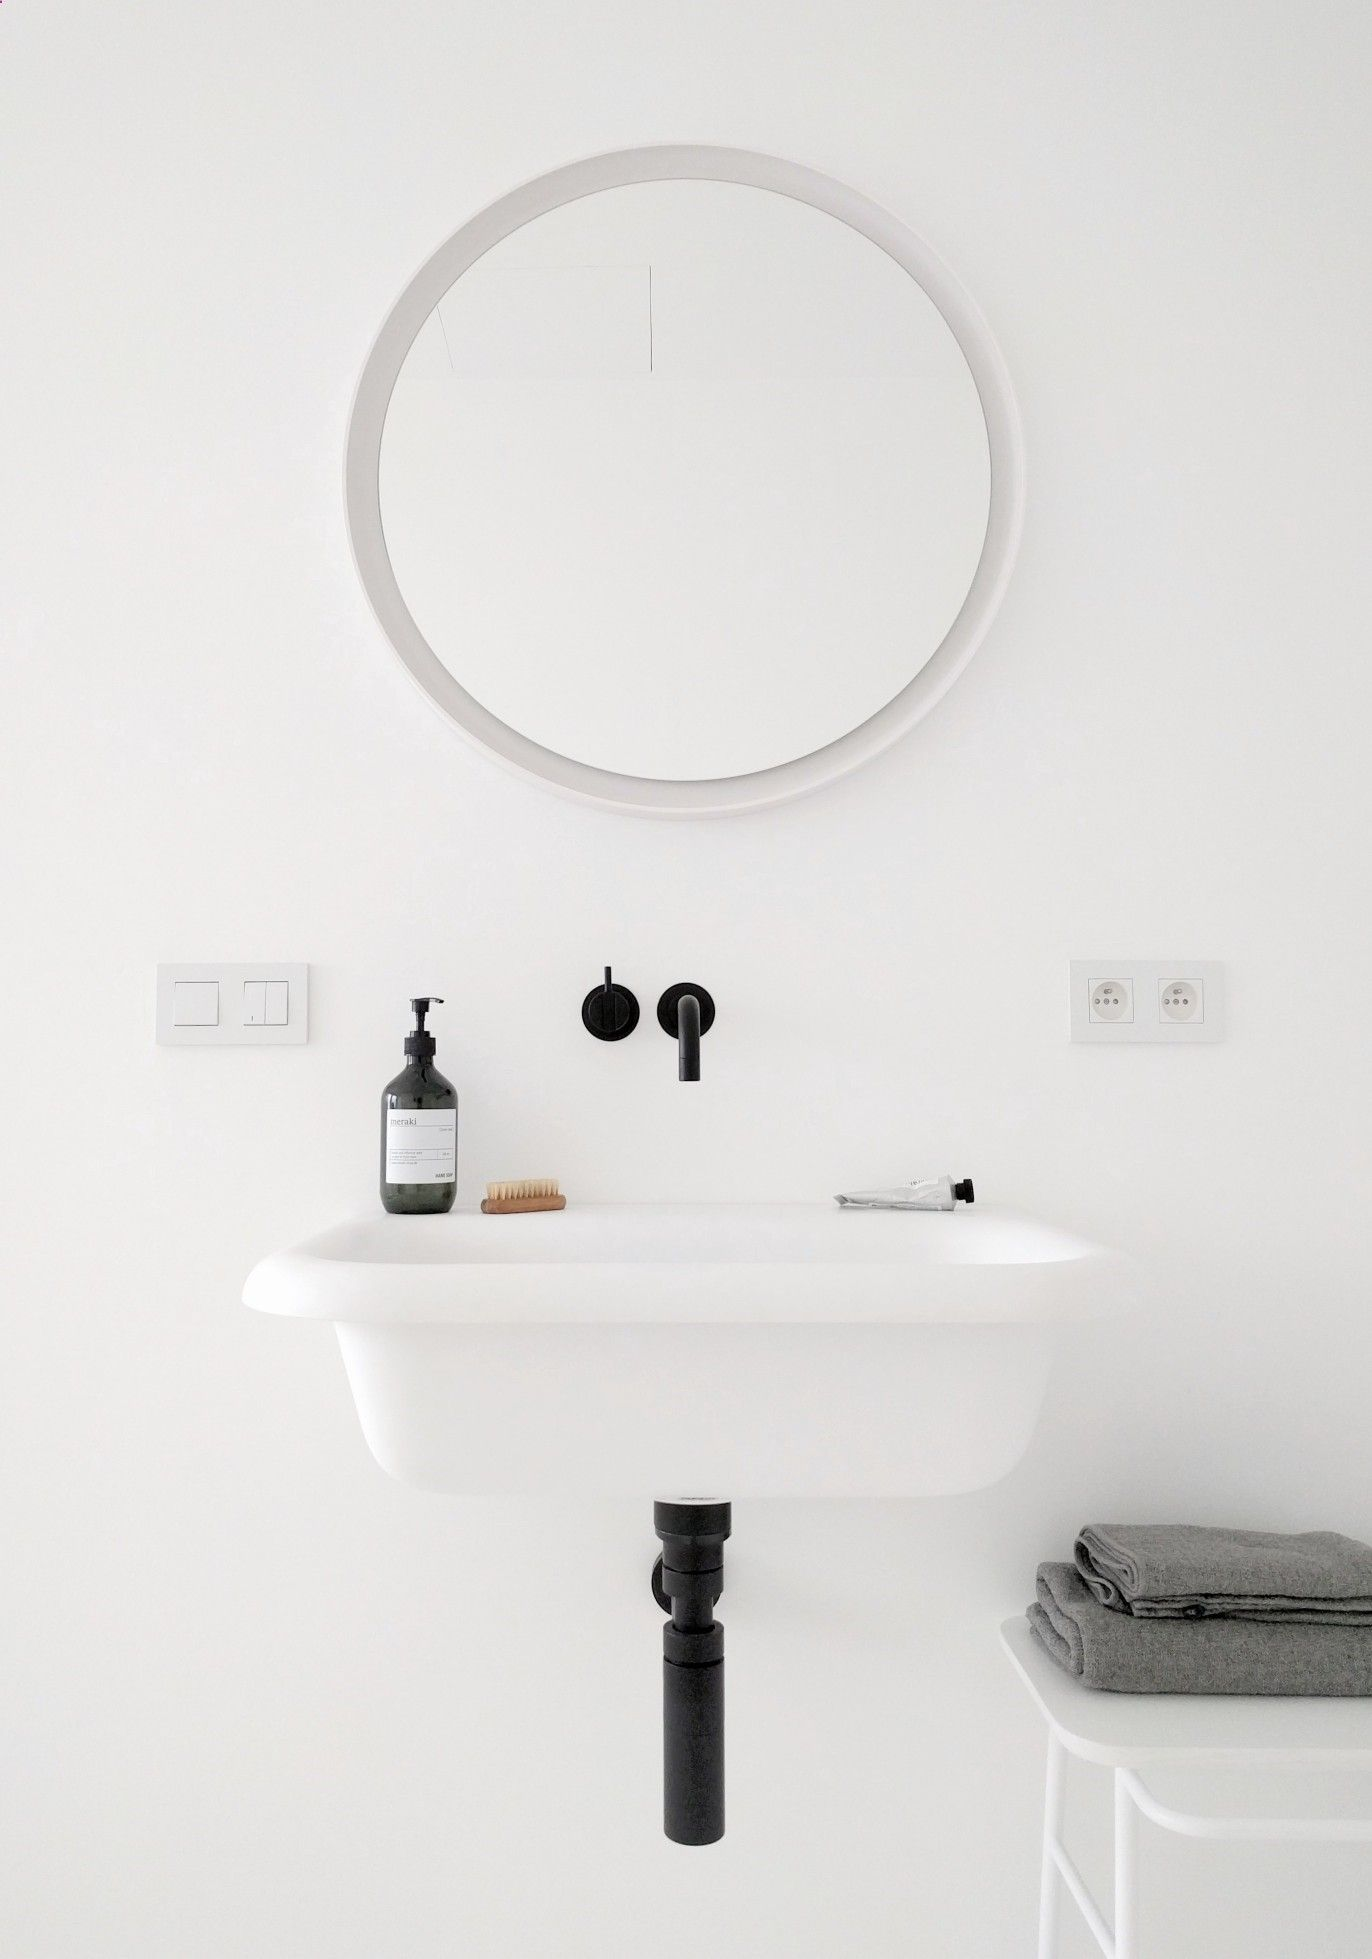 Attractive Agape Ottocento Washbasin   Mirror Memory   Vola Faucet   Black U0026 White  Bathroom   Kontex Towel   Meraki Soap   Niko Intense   Ex T Stool By Norm  Architects Design Ideas